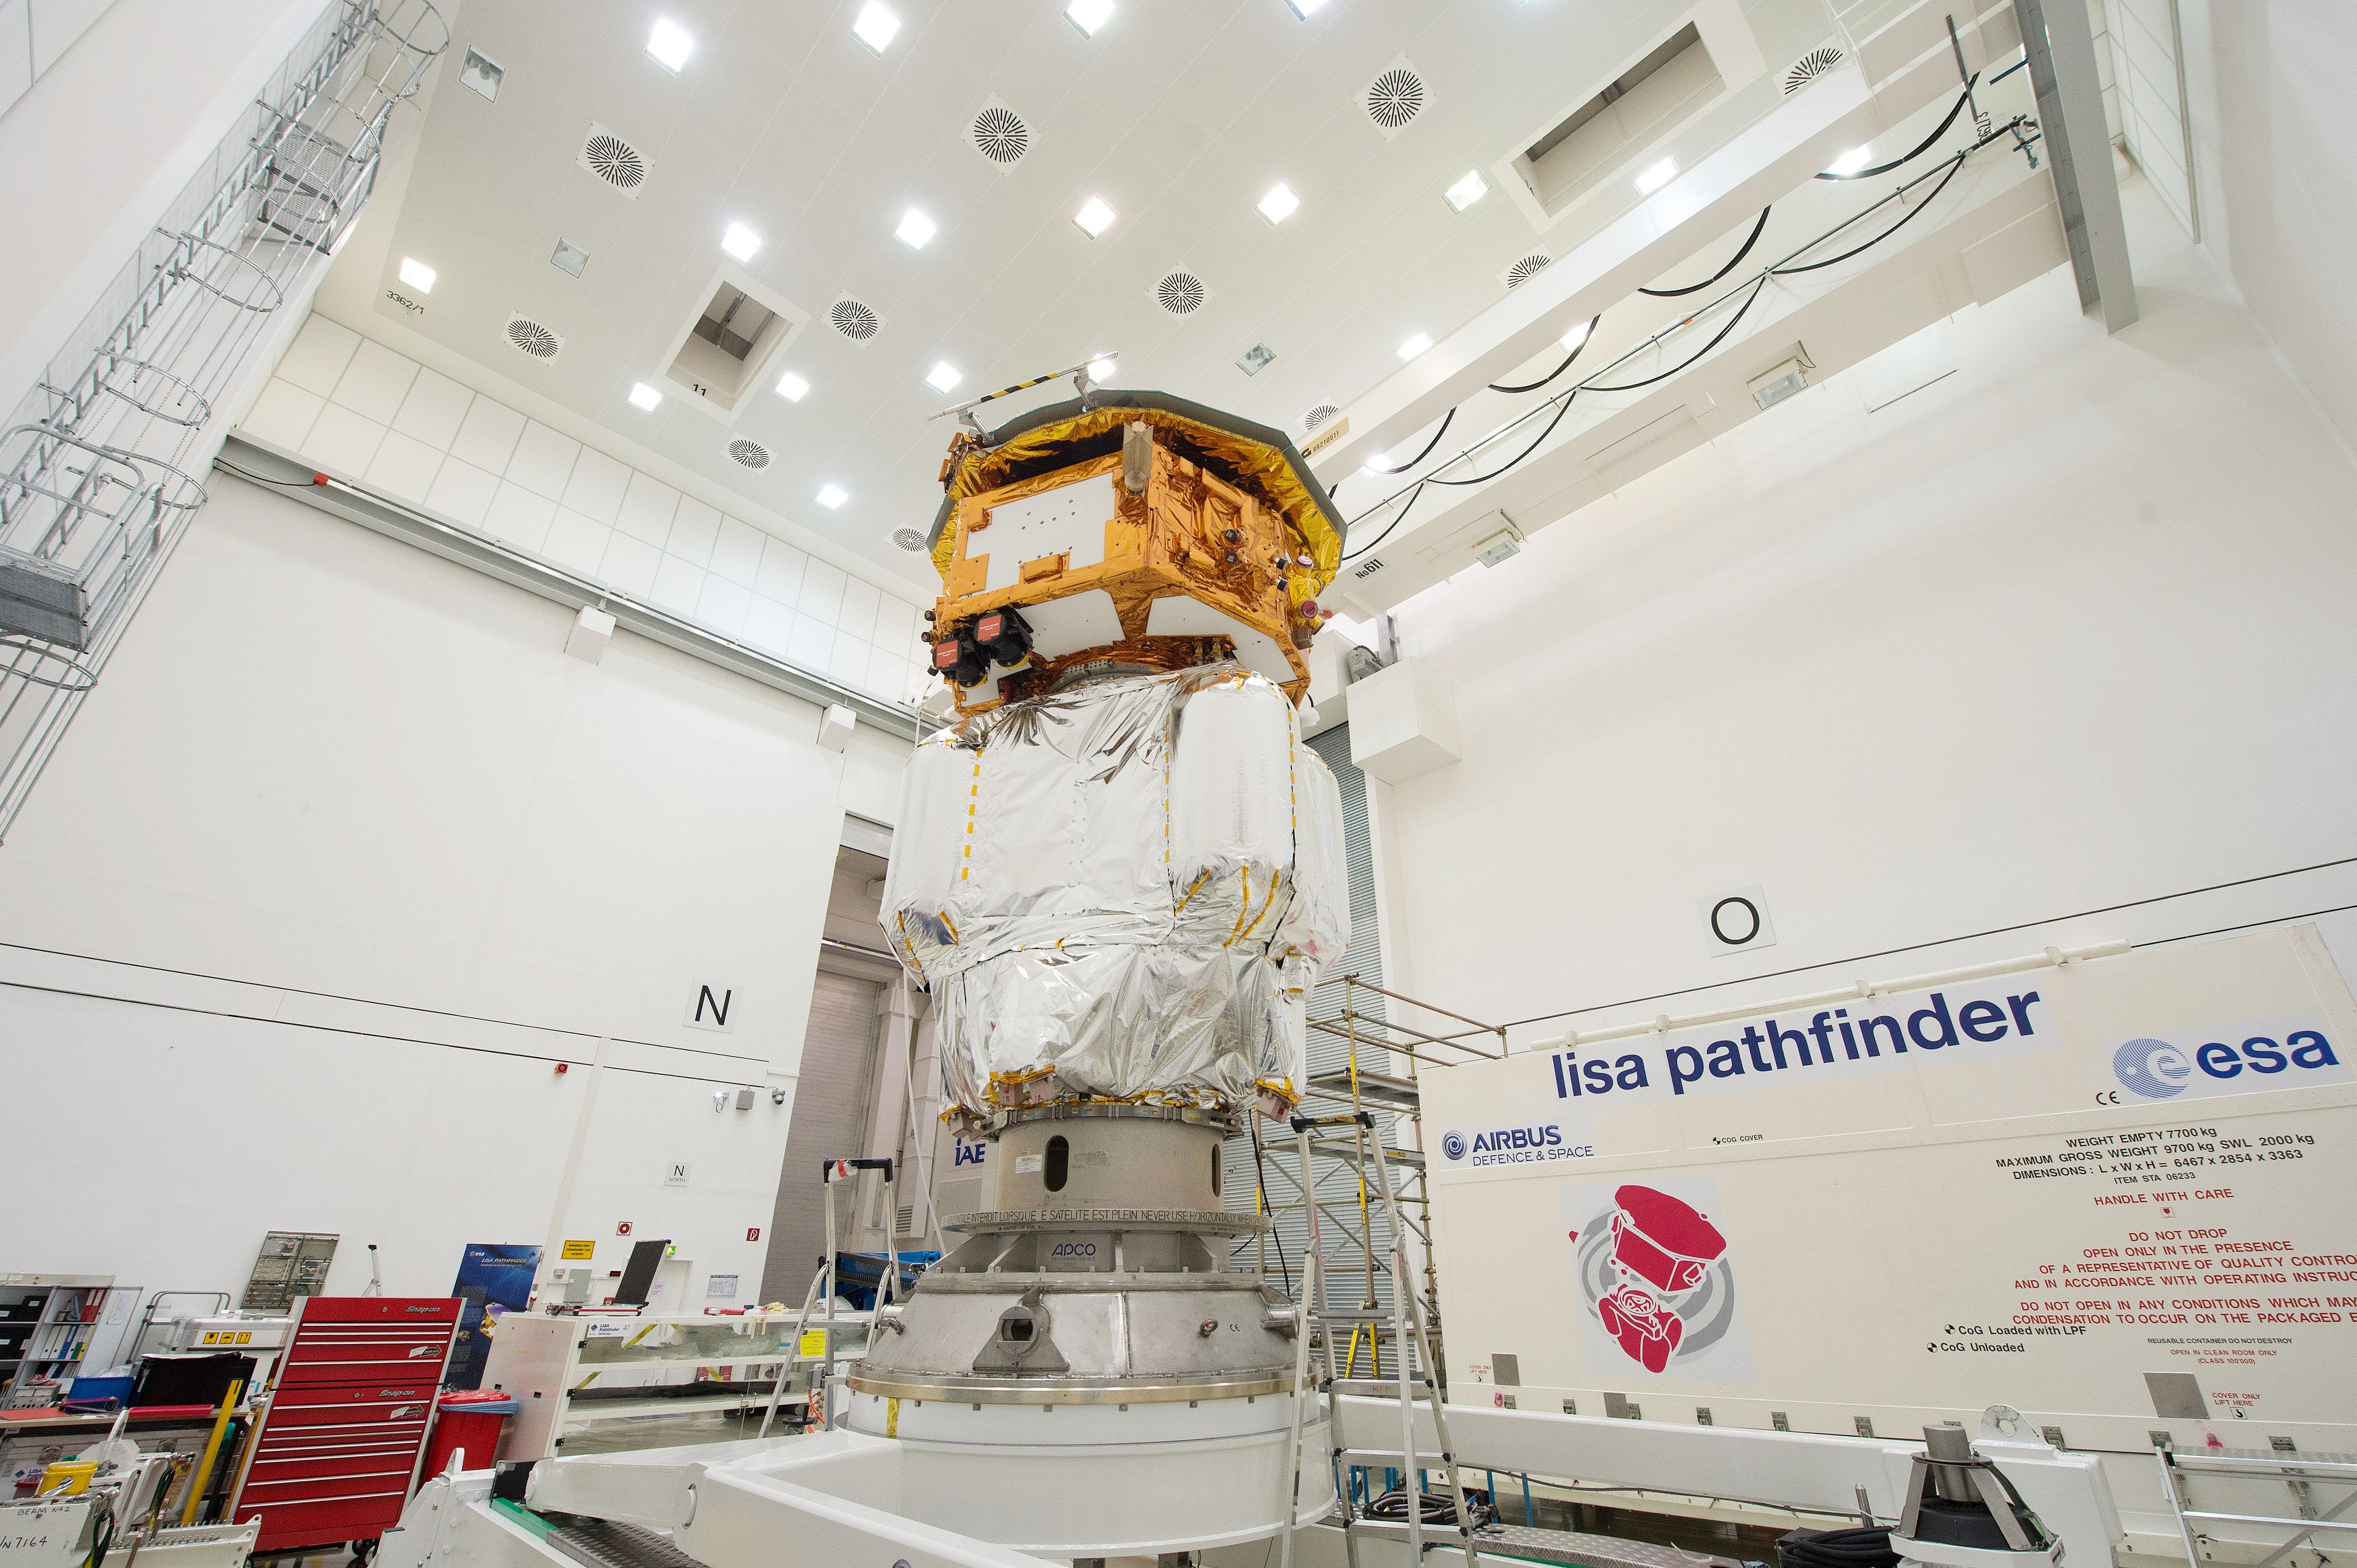 1567215922299-LISA_Pathfinder_launch_composite_at_IABG_s_space_test_centre_4_orig.jpg